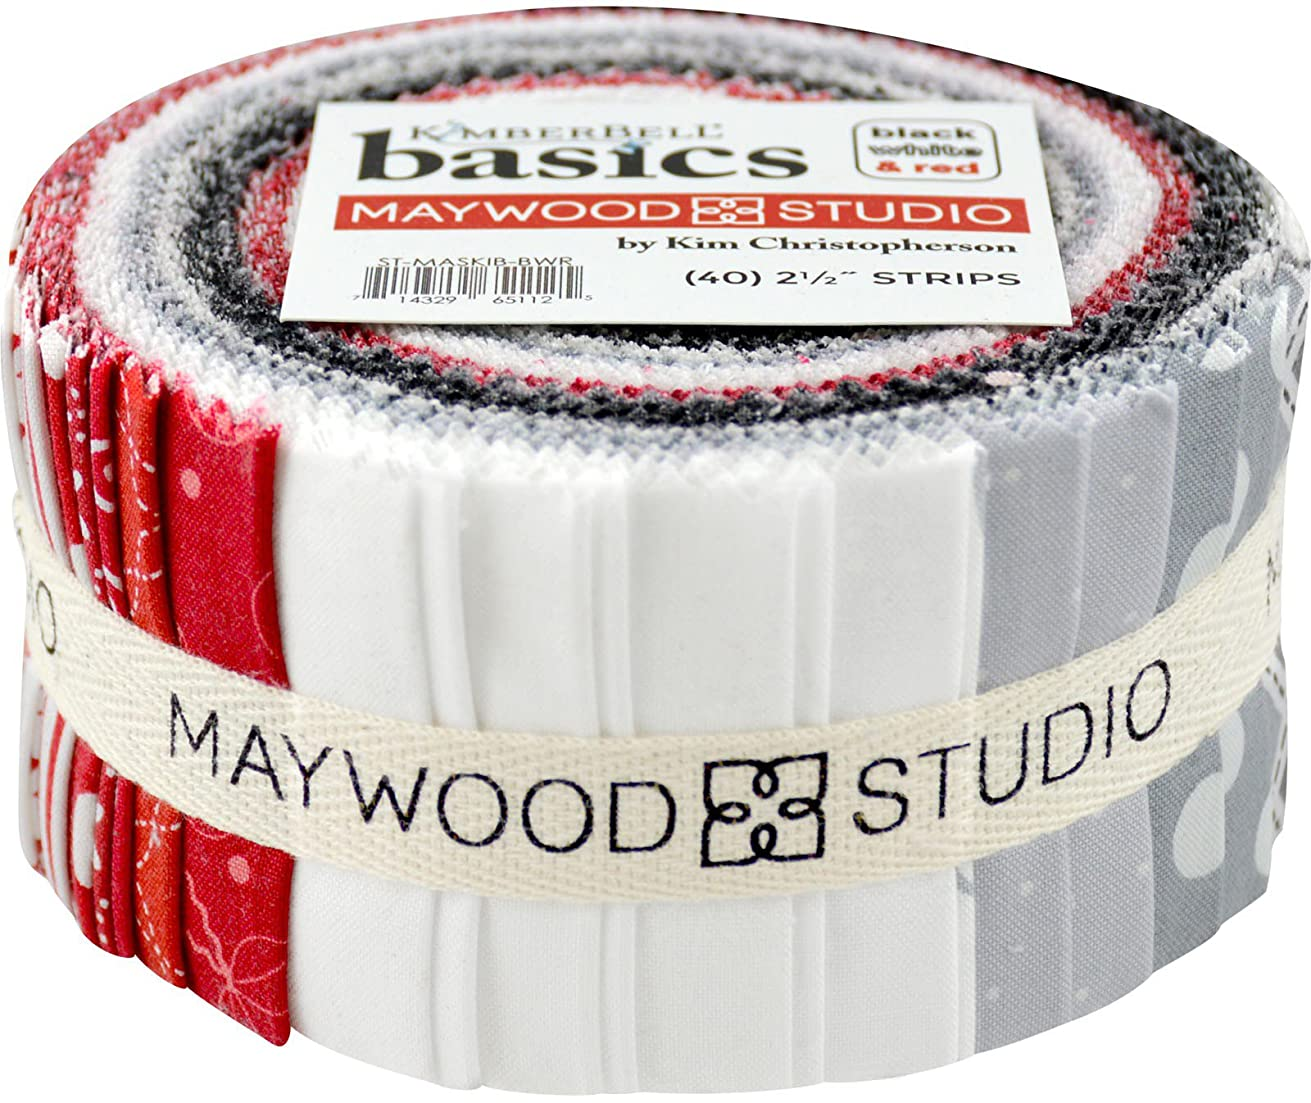 KimberBell Basics Black White & Red Strips 40 2.5-inch Strips Jelly Roll Maywood Studio